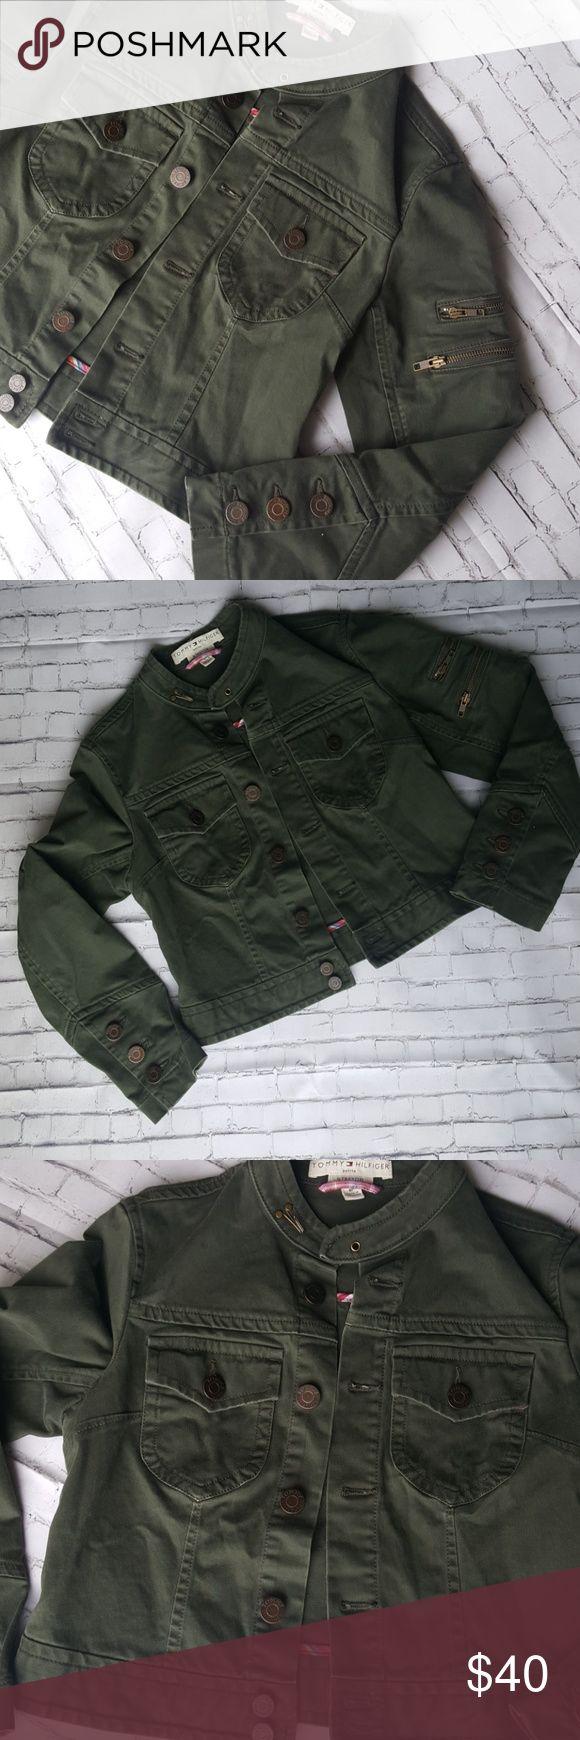 Tommy Hilfiger Army green stretch Military jacket Tommy Hilfiger Army green fitted stretch Military Jacket/Blazer size 6P 98% cotton 2% spandex Tommy Hilfiger Jackets & Coats Blazers